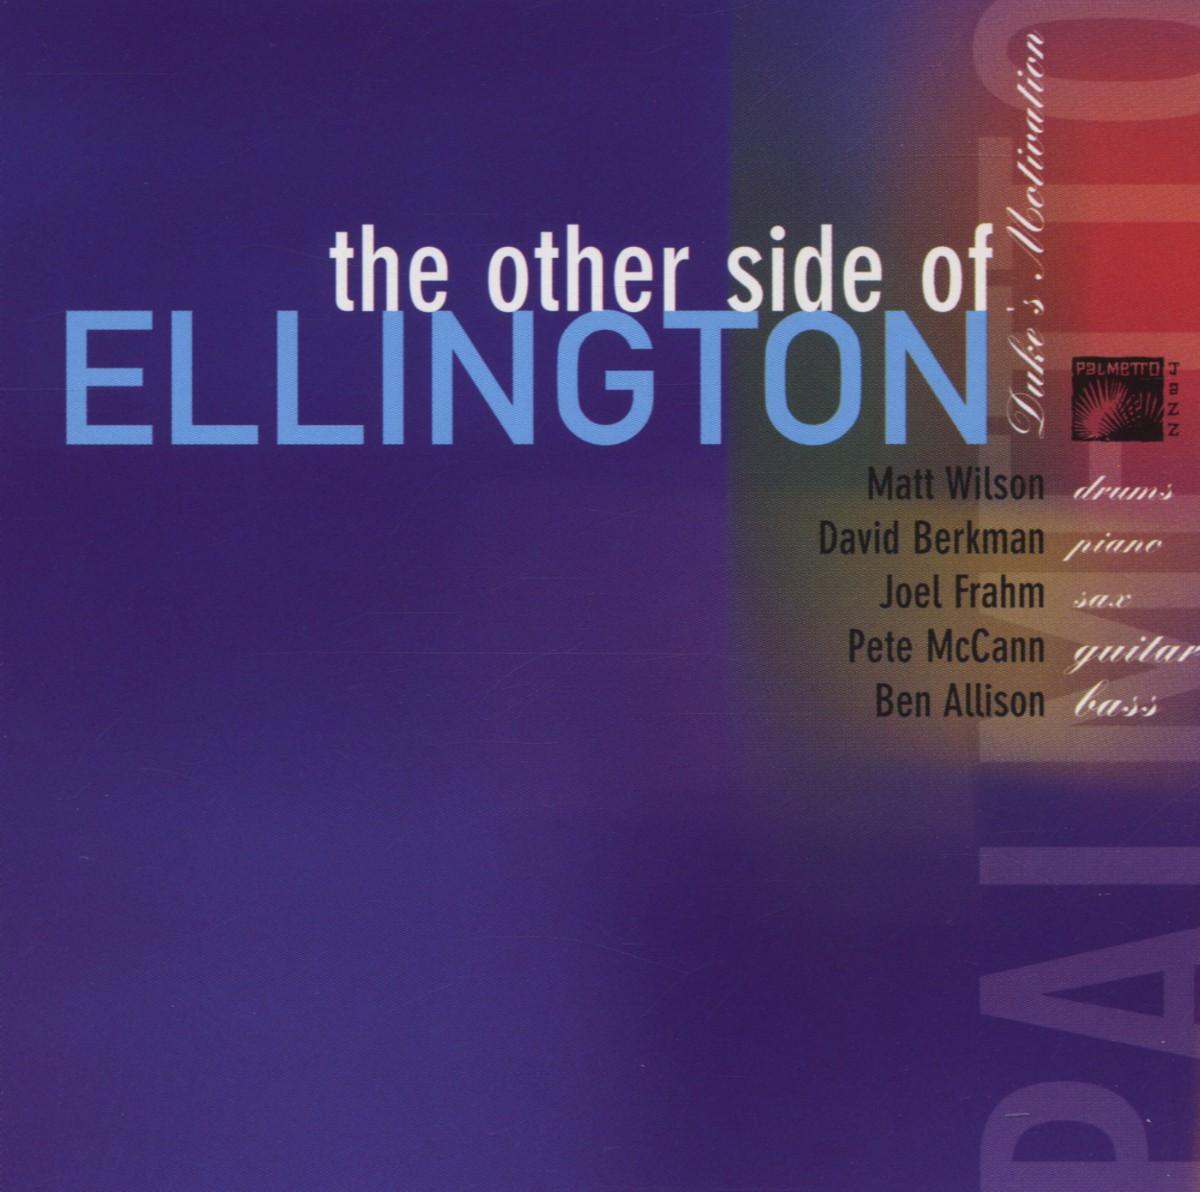 Other Side of Ellington - Palmetto All-stars - Musik - POP - 0753957205126 - October 12, 1999